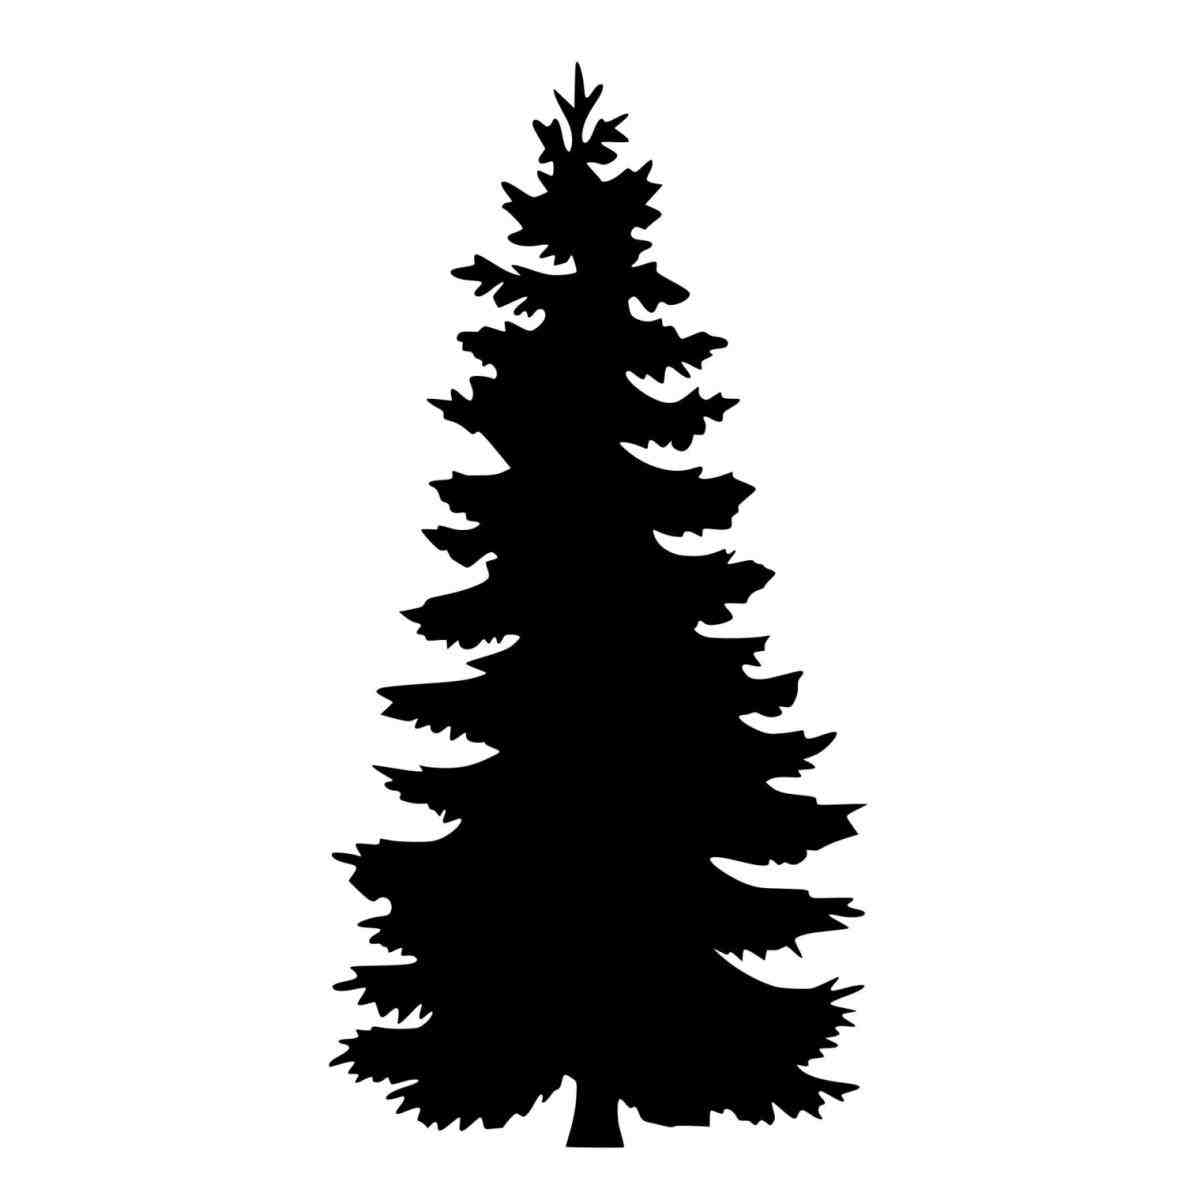 Cedar tree silhouette clipart clip art free 59+ Pine Tree Silhouette Clip Art | ClipartLook clip art free